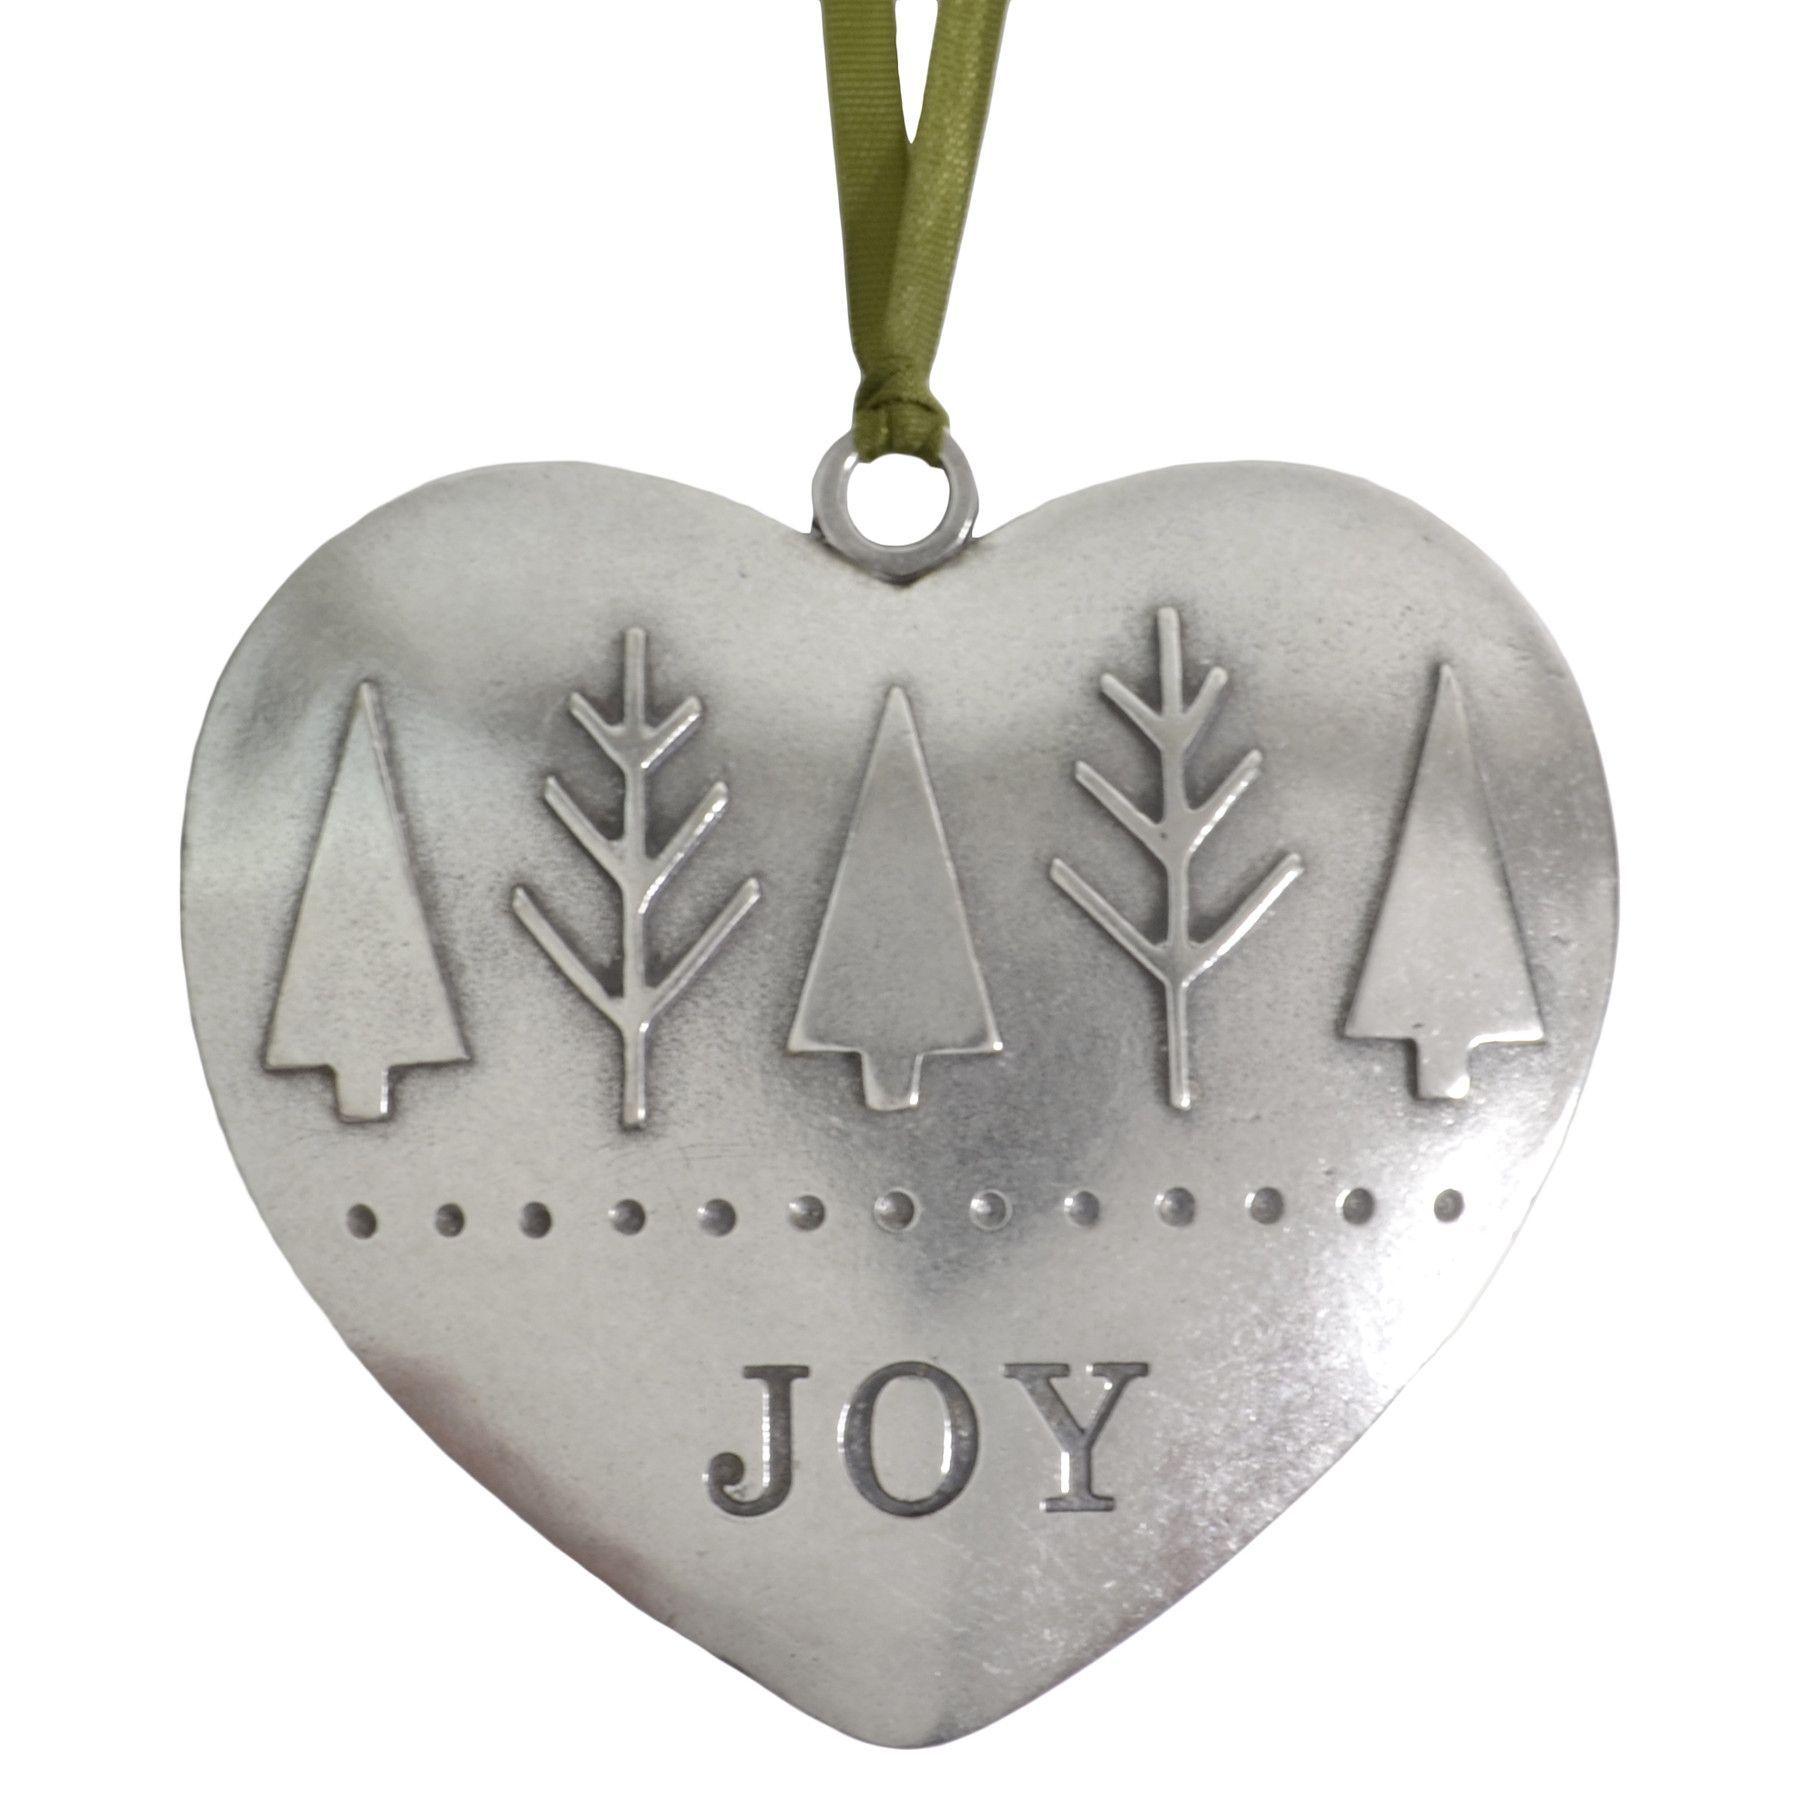 Beehive ornament - Beehive Handmade Joy Heart Shaped Pewter Ornament